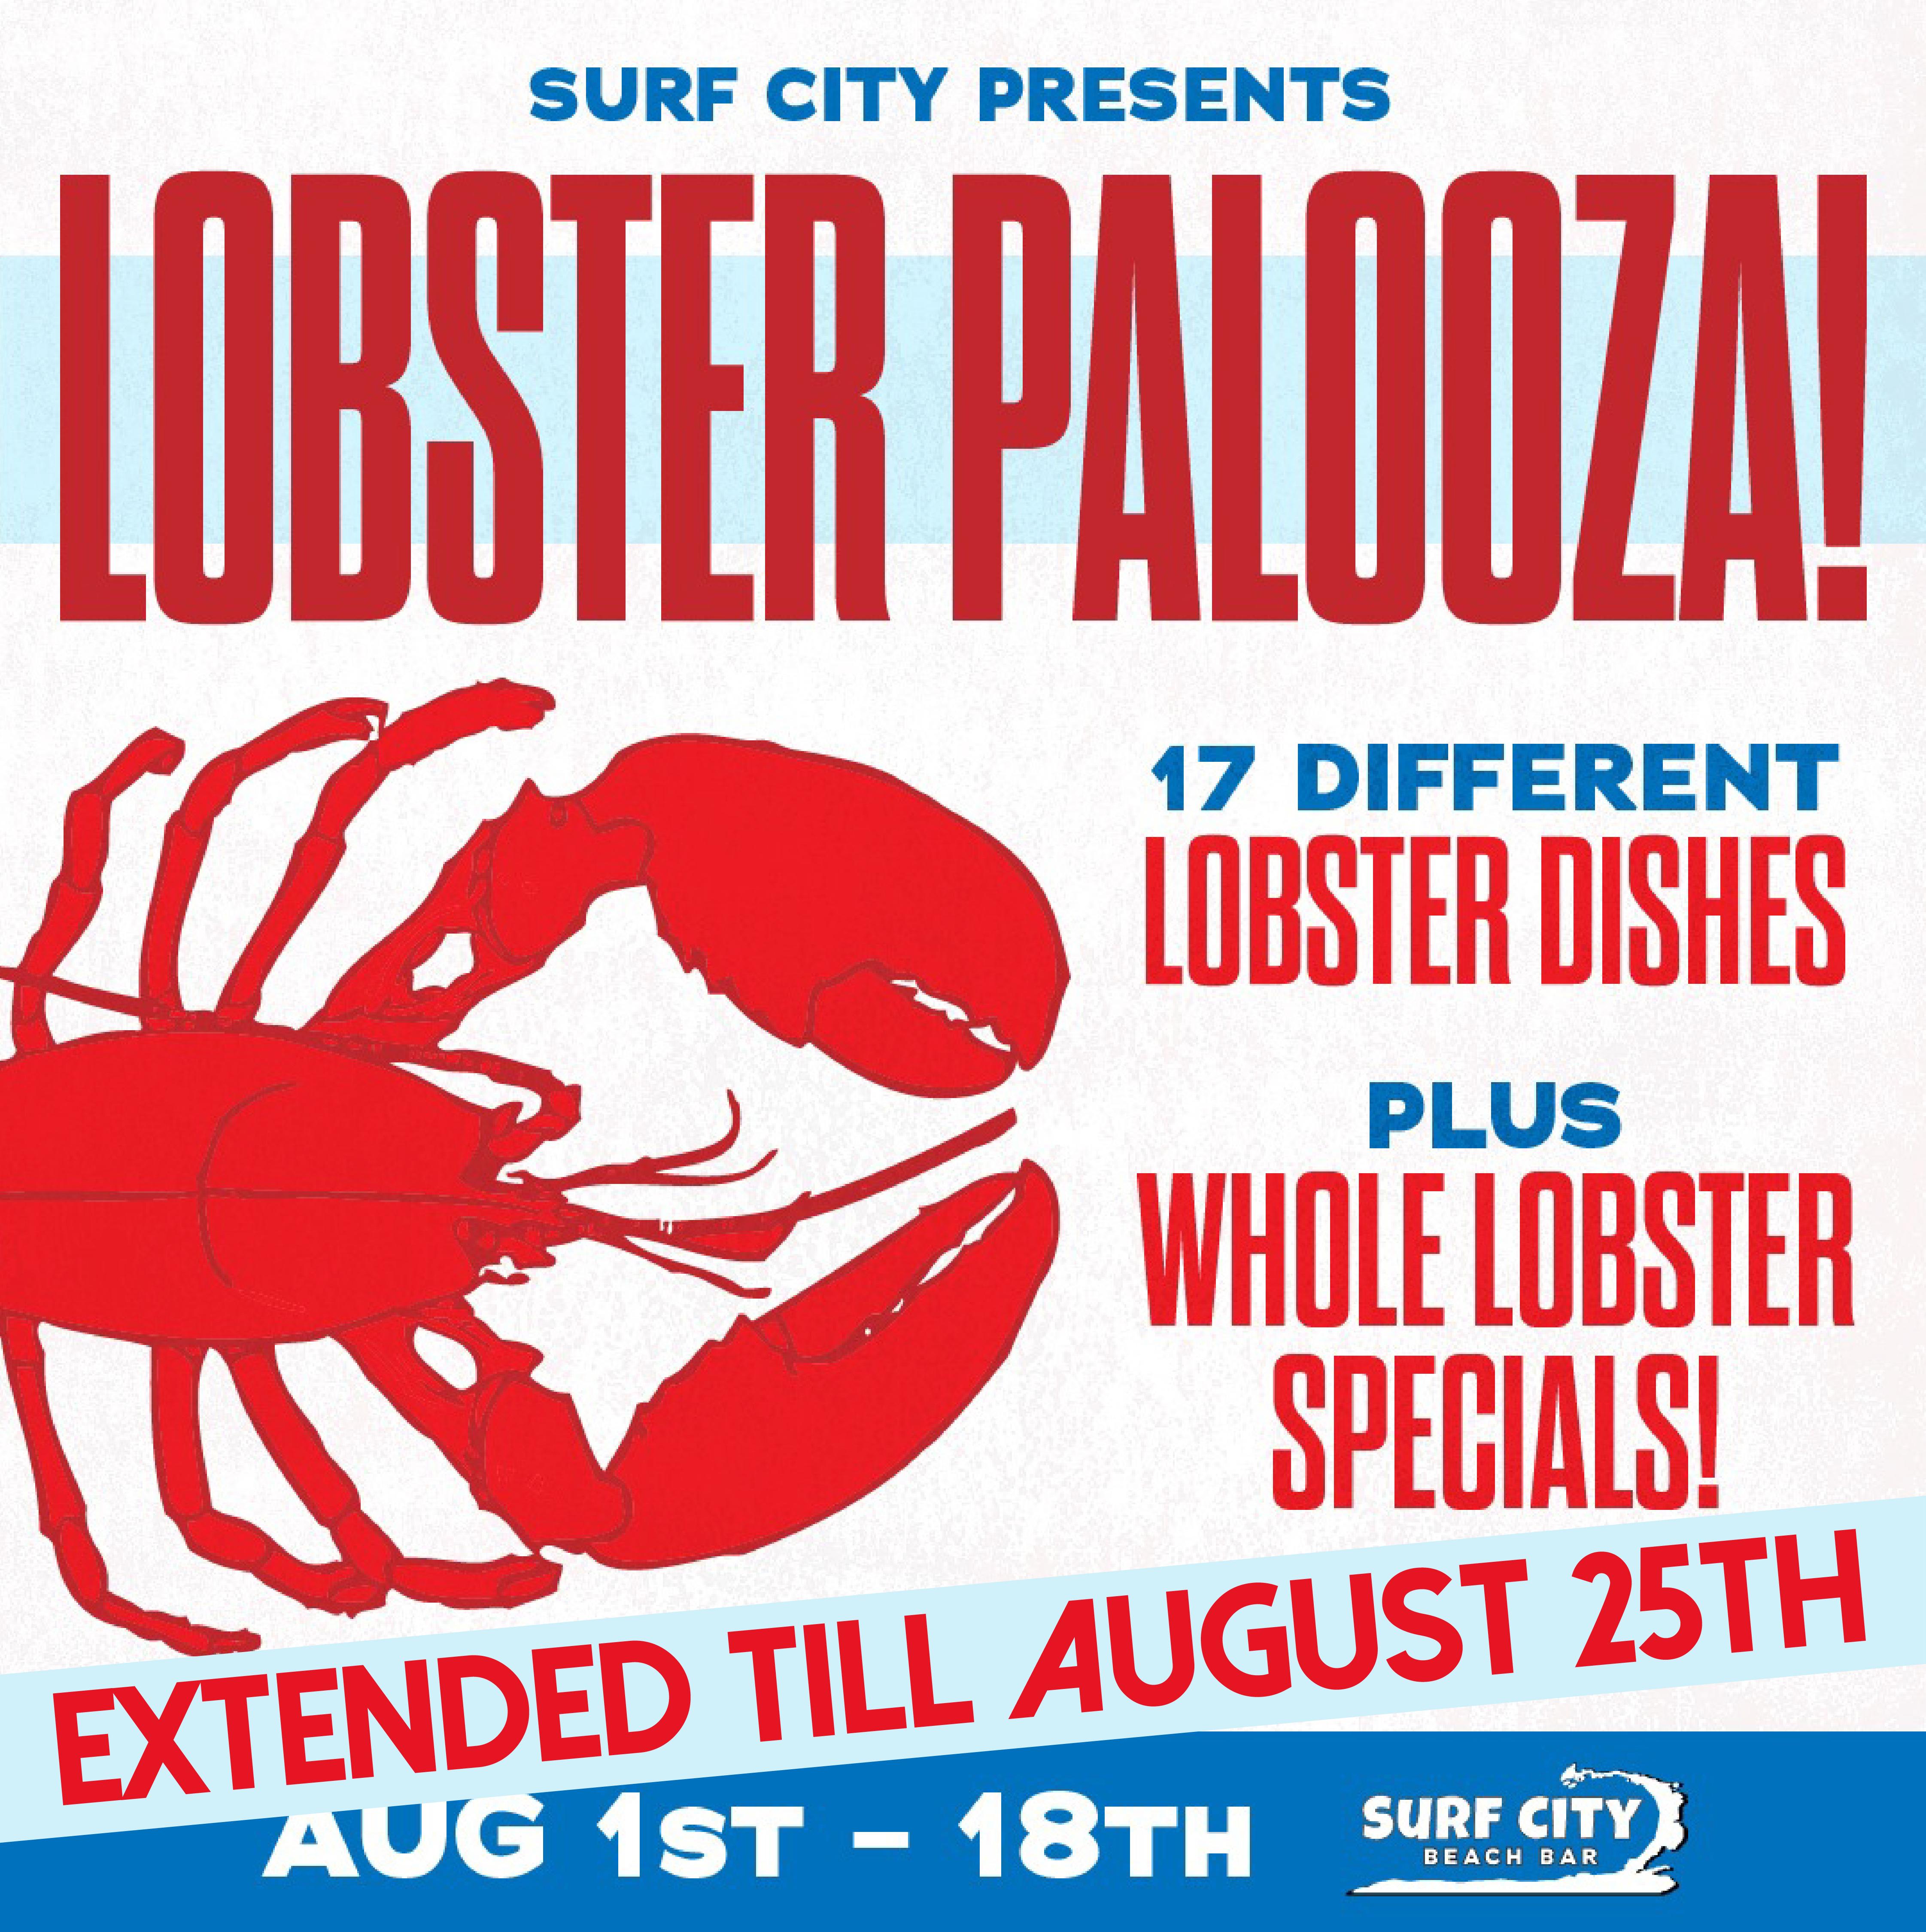 Lobster Palooza